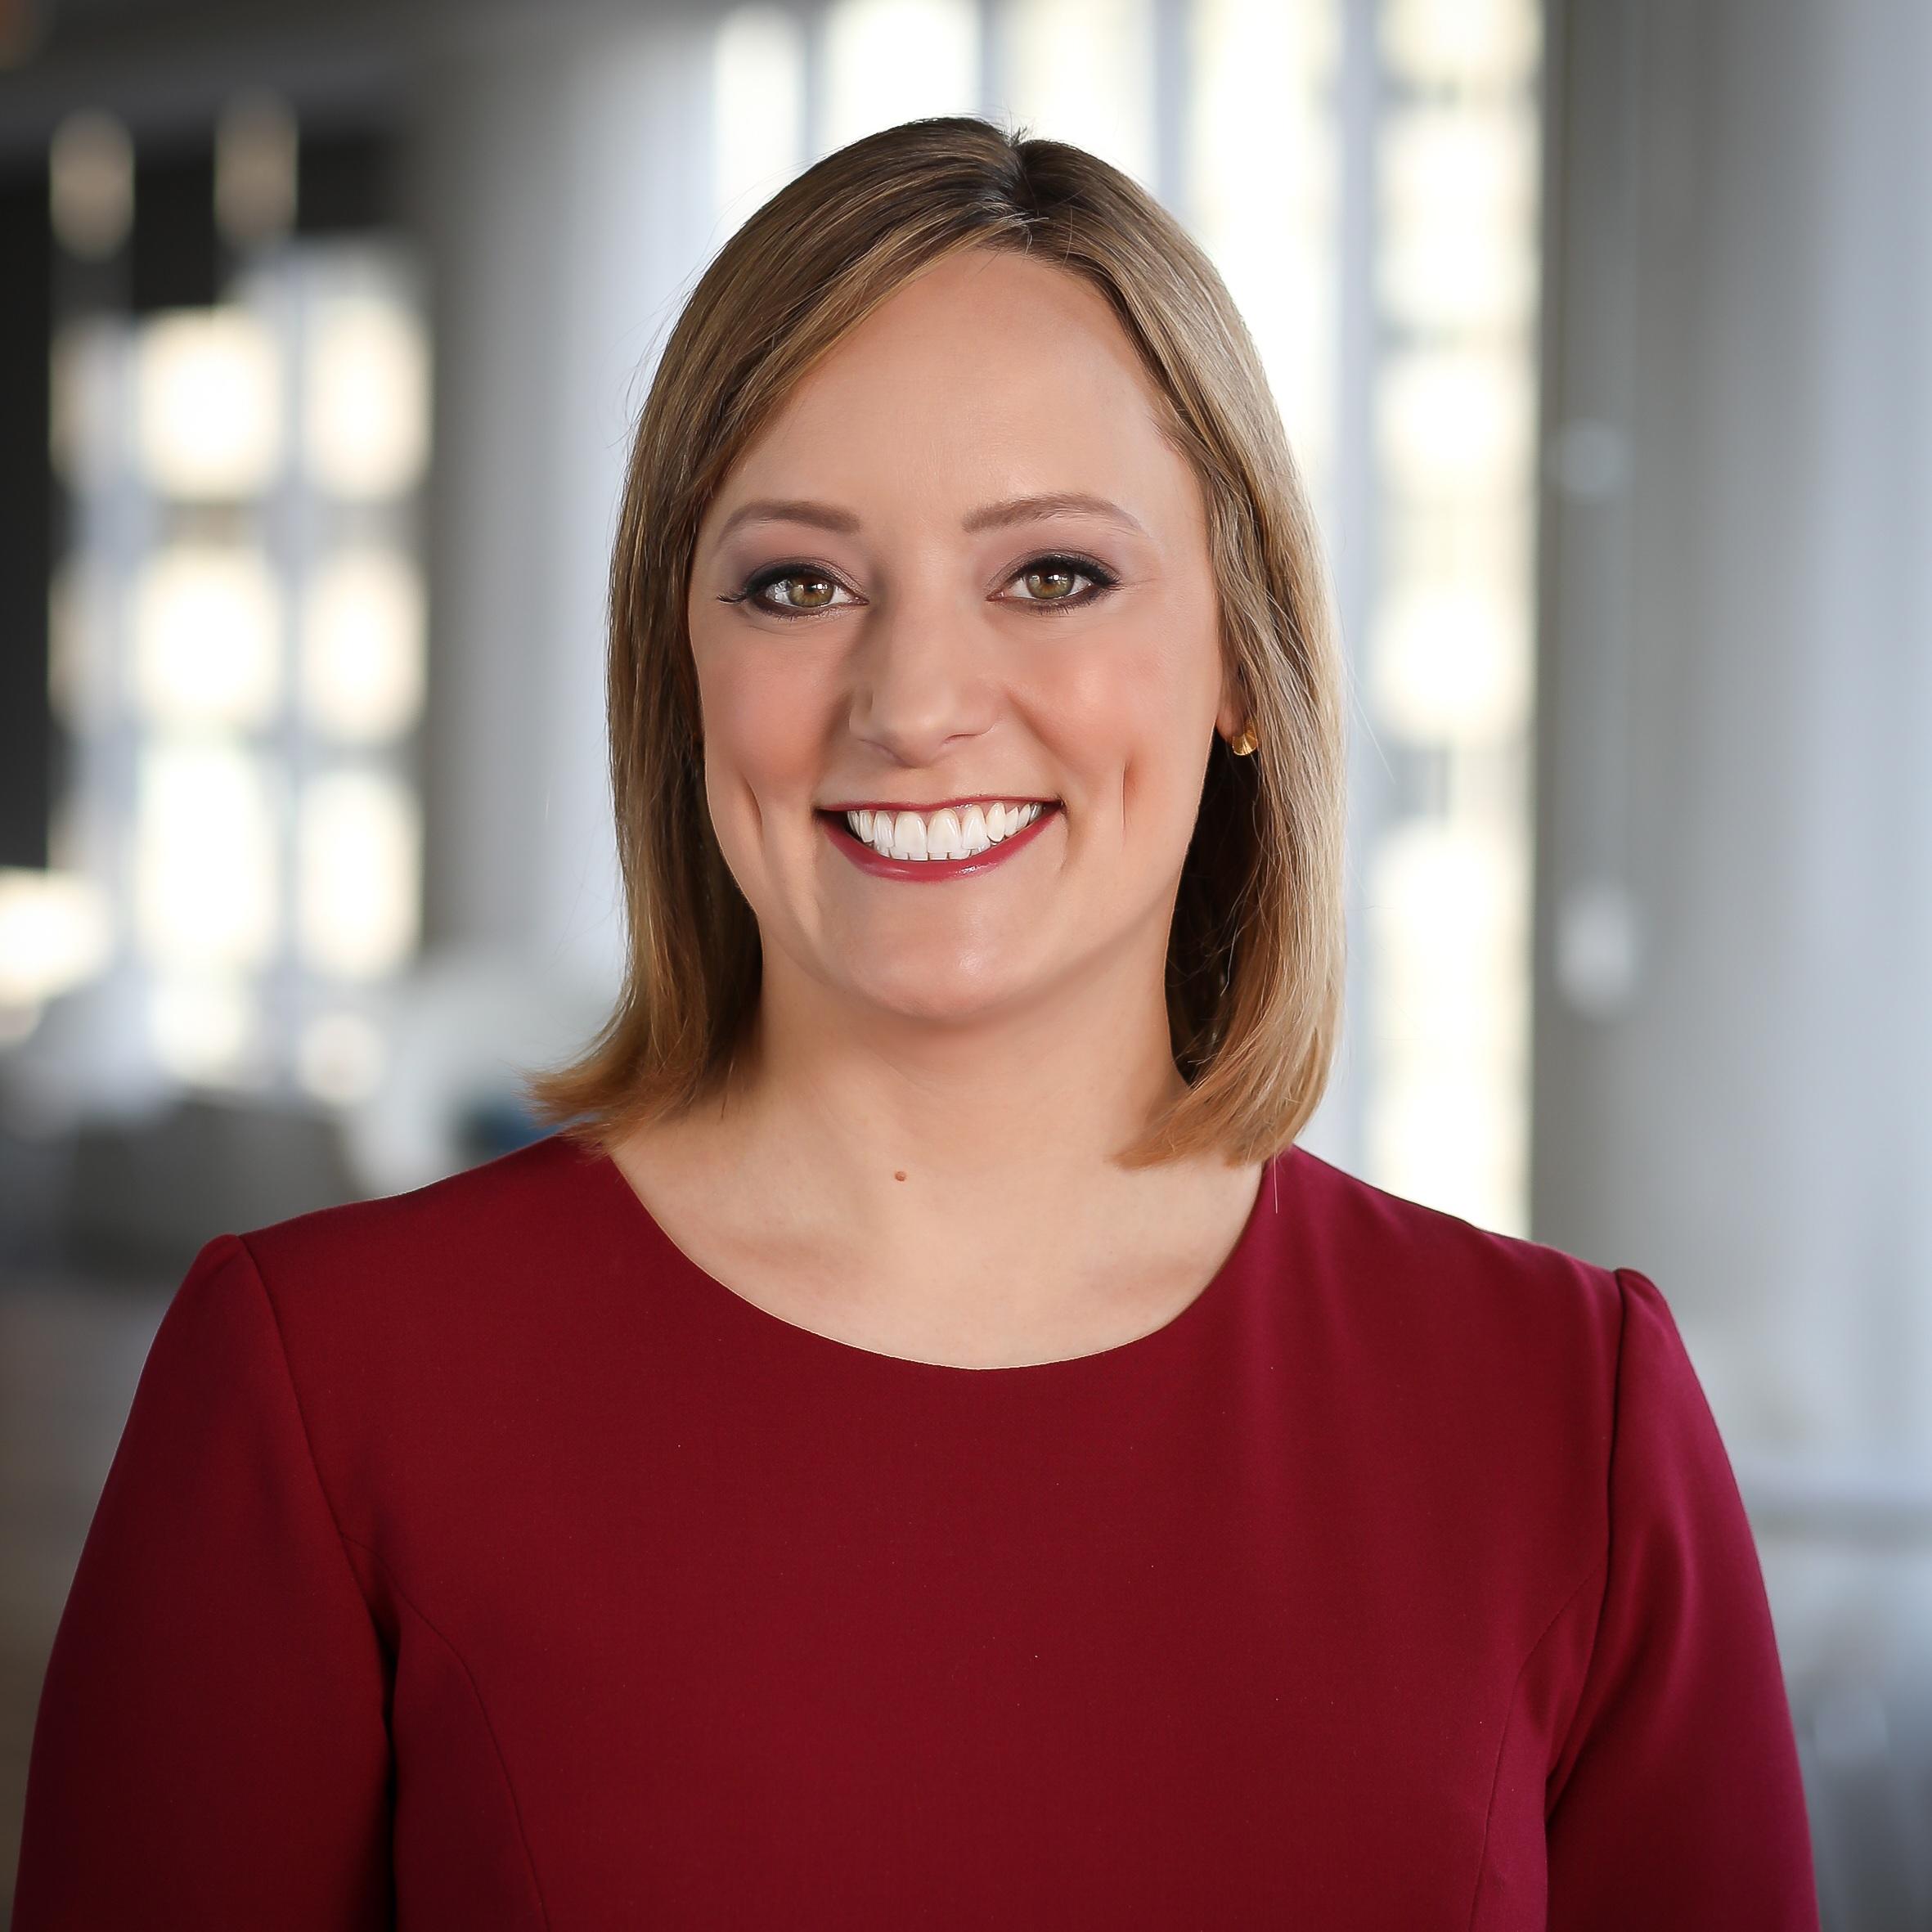 Anna Palmer - SENIOR CORRESPONDENT, POLITICO